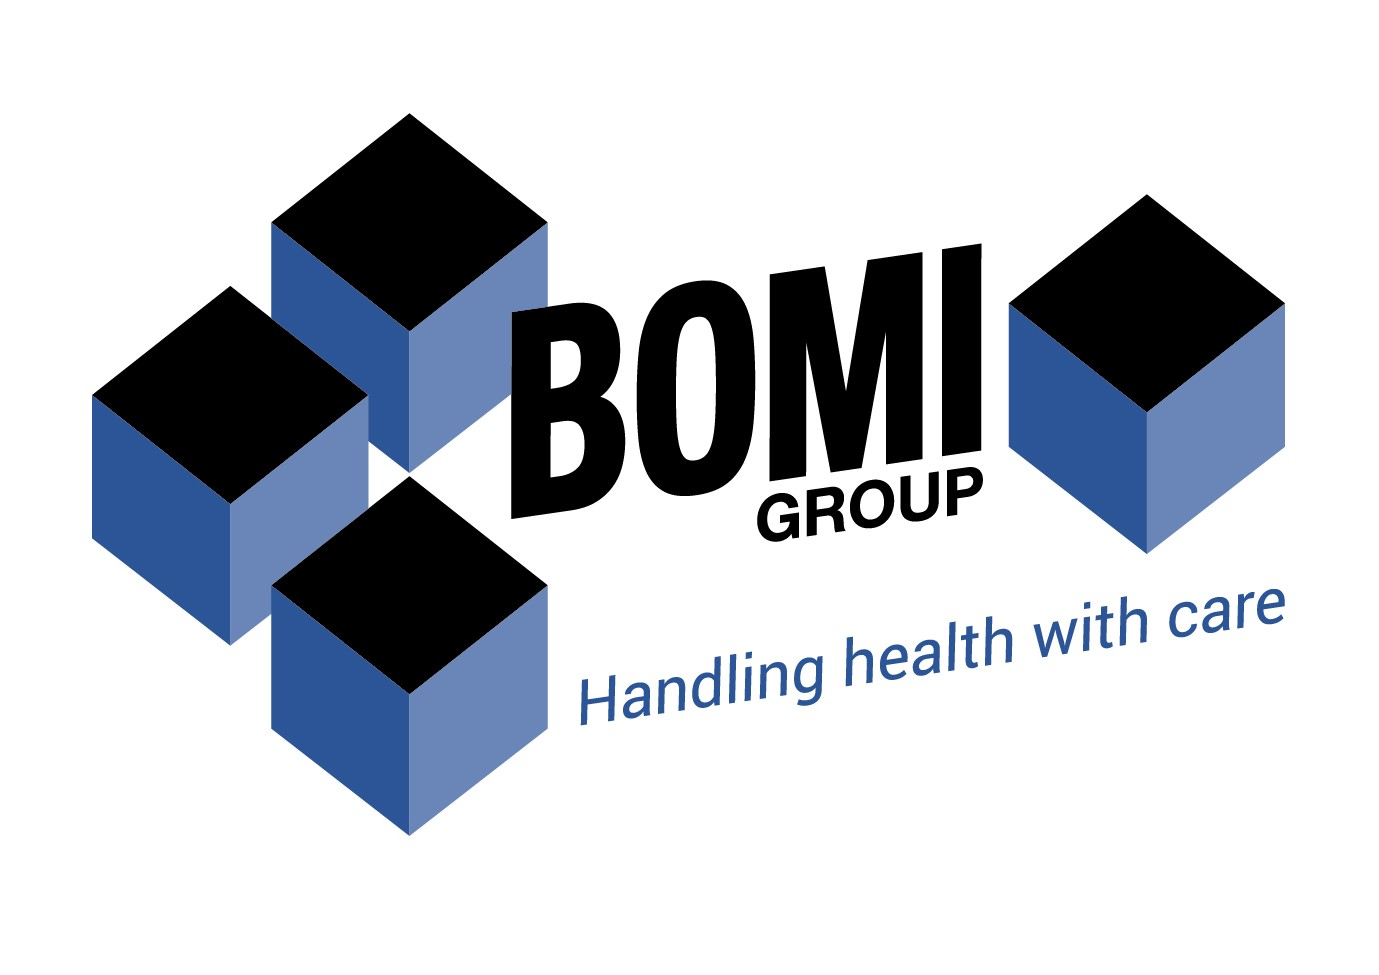 Boni Group